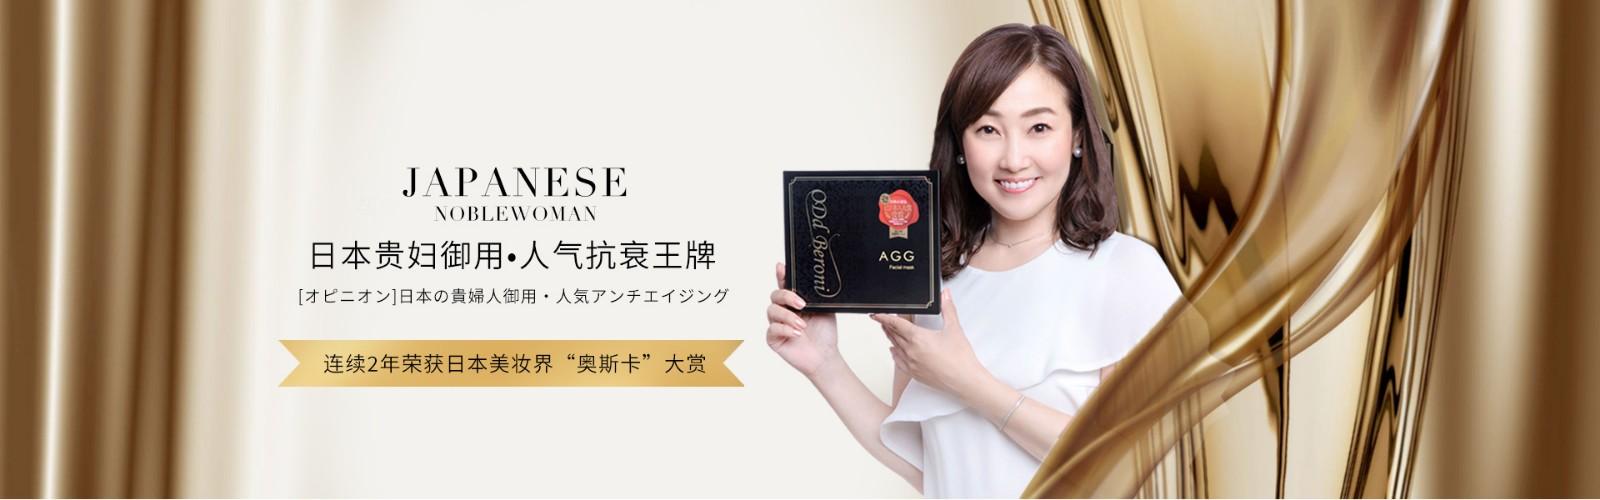 AGG产品banner4